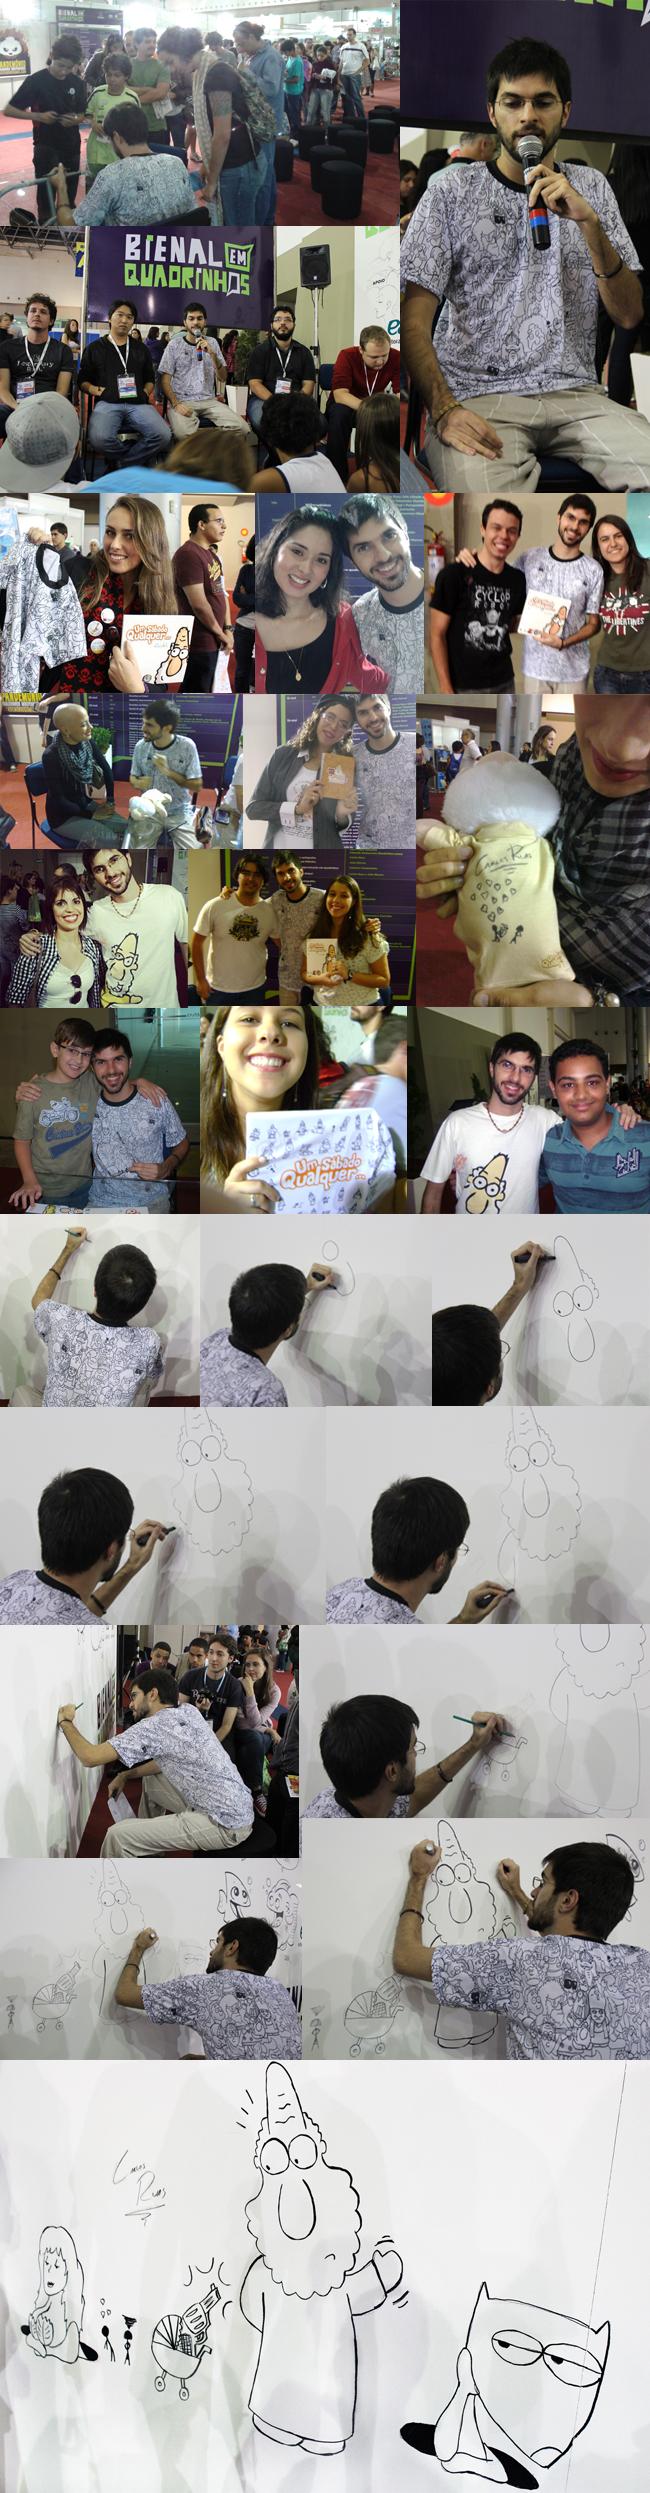 Bienal de BH 2012